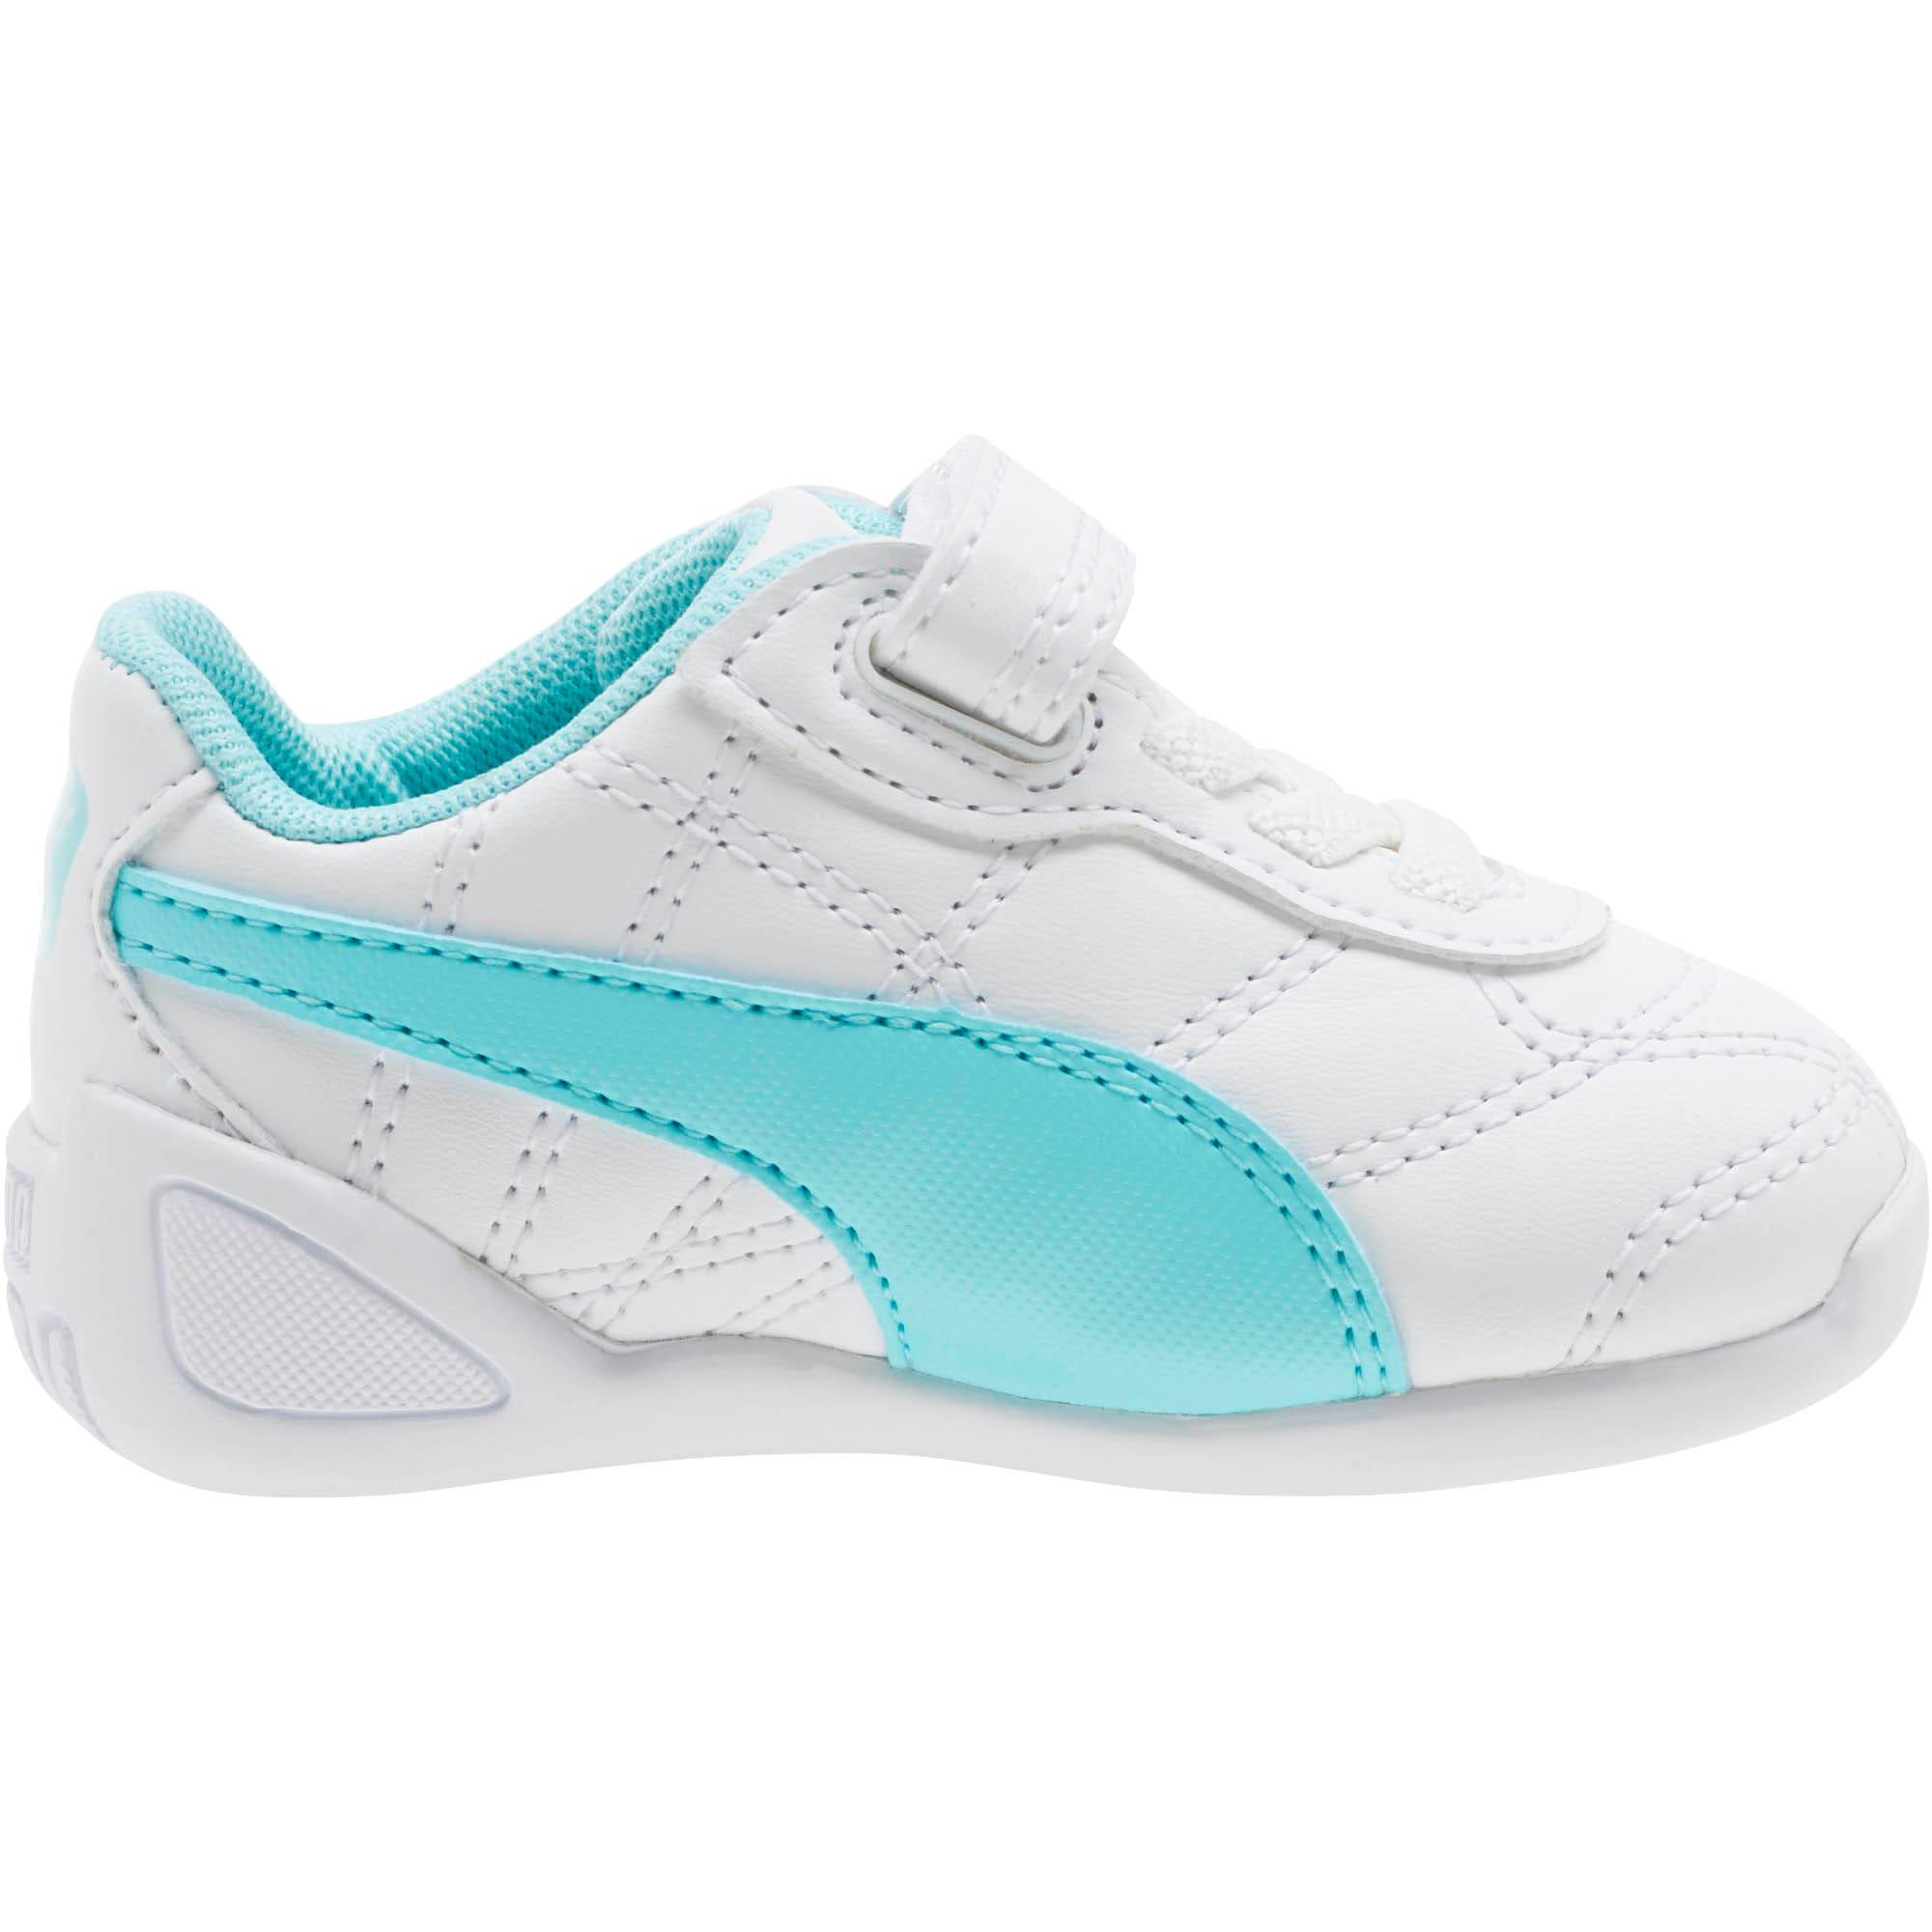 Thumbnail 3 of Tune Cat 3 AC Toddler Shoes, Puma White-Island Paradise, medium